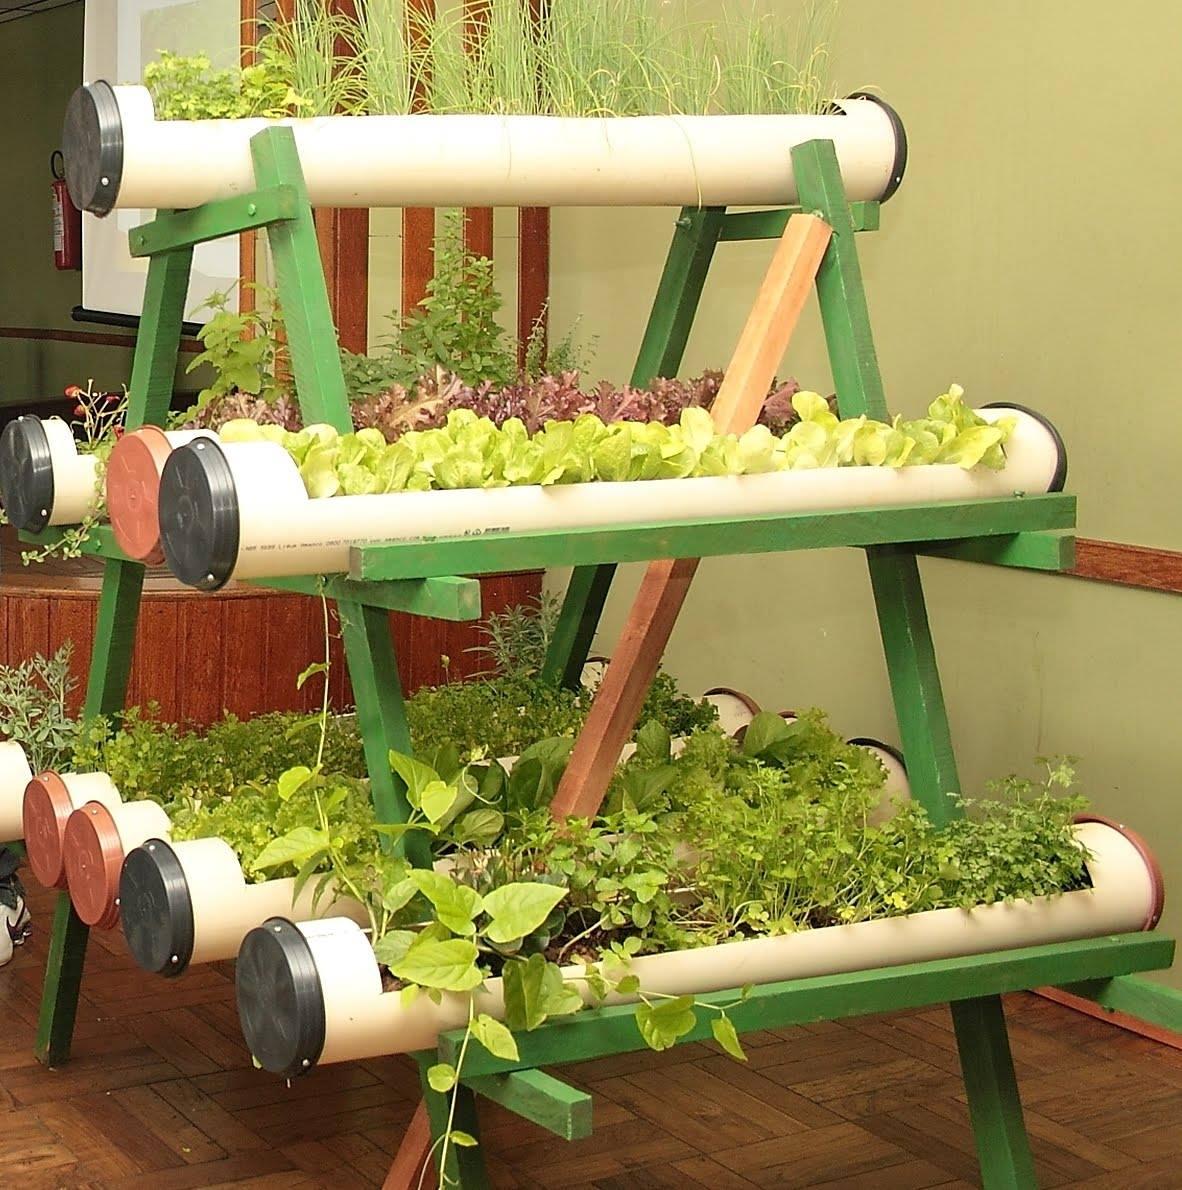 Dise a tu propio jardin de hortalizas 15 curso de - Disena tu hogar ...